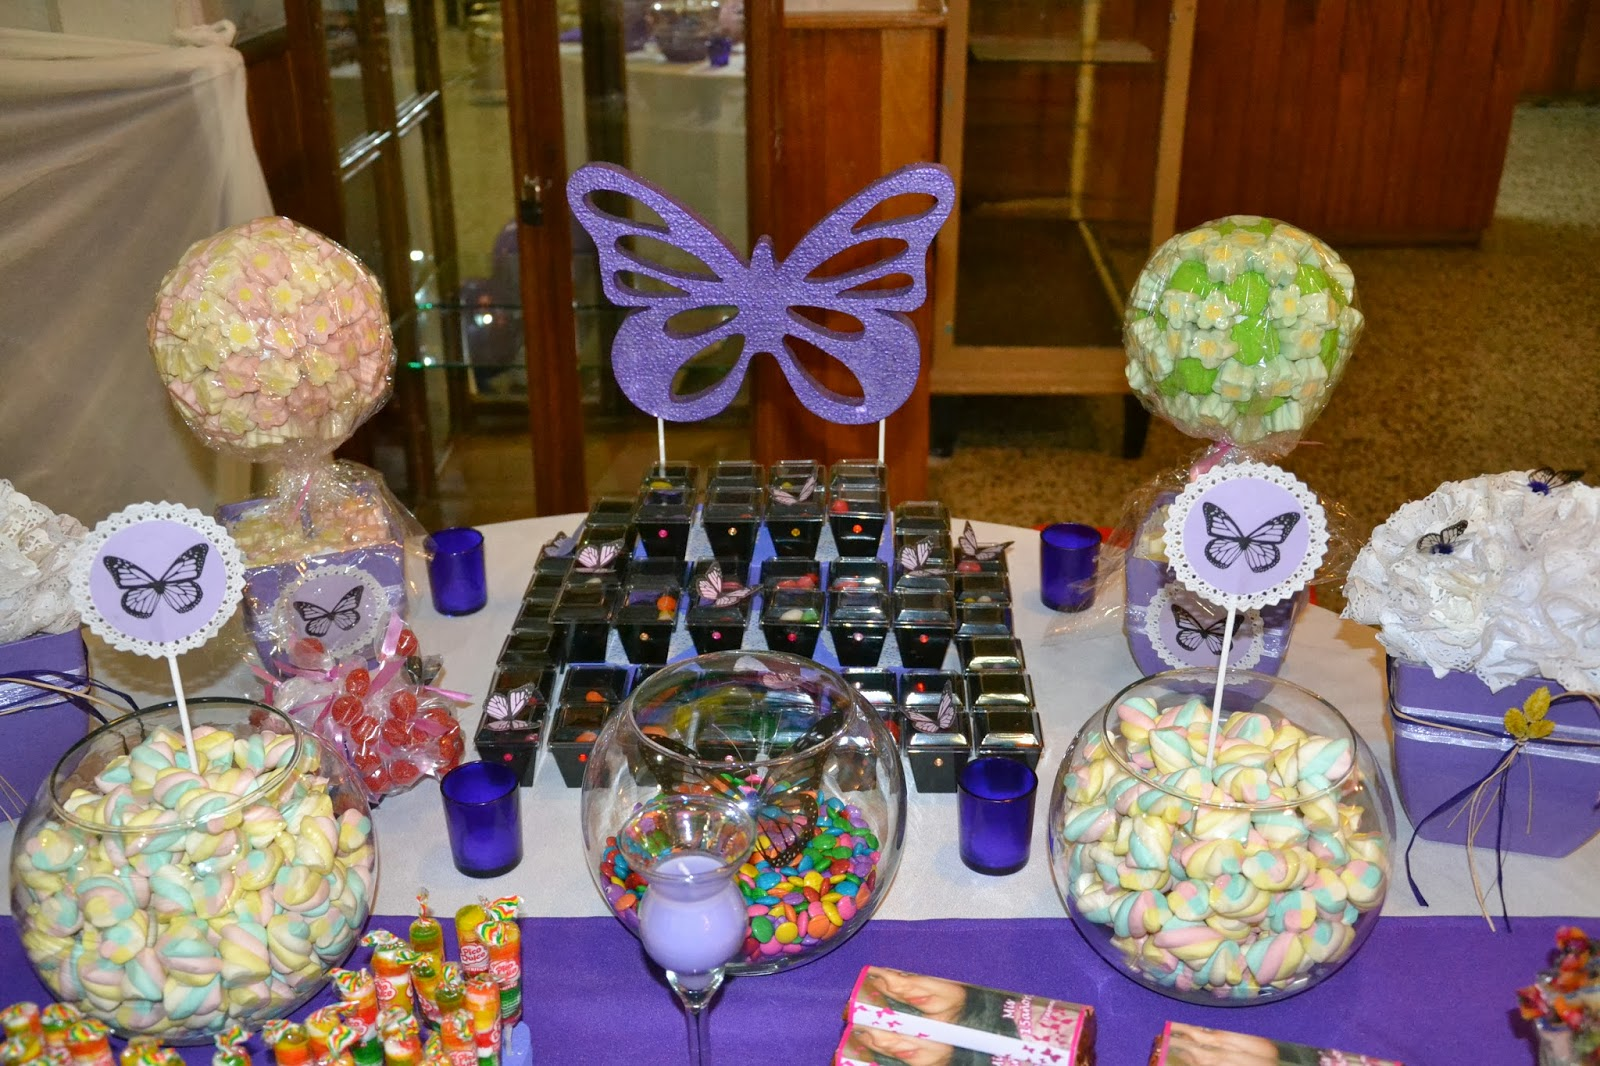 Olivais mariposas 15 a os yasm n for Decoracion para 15 anos 2016